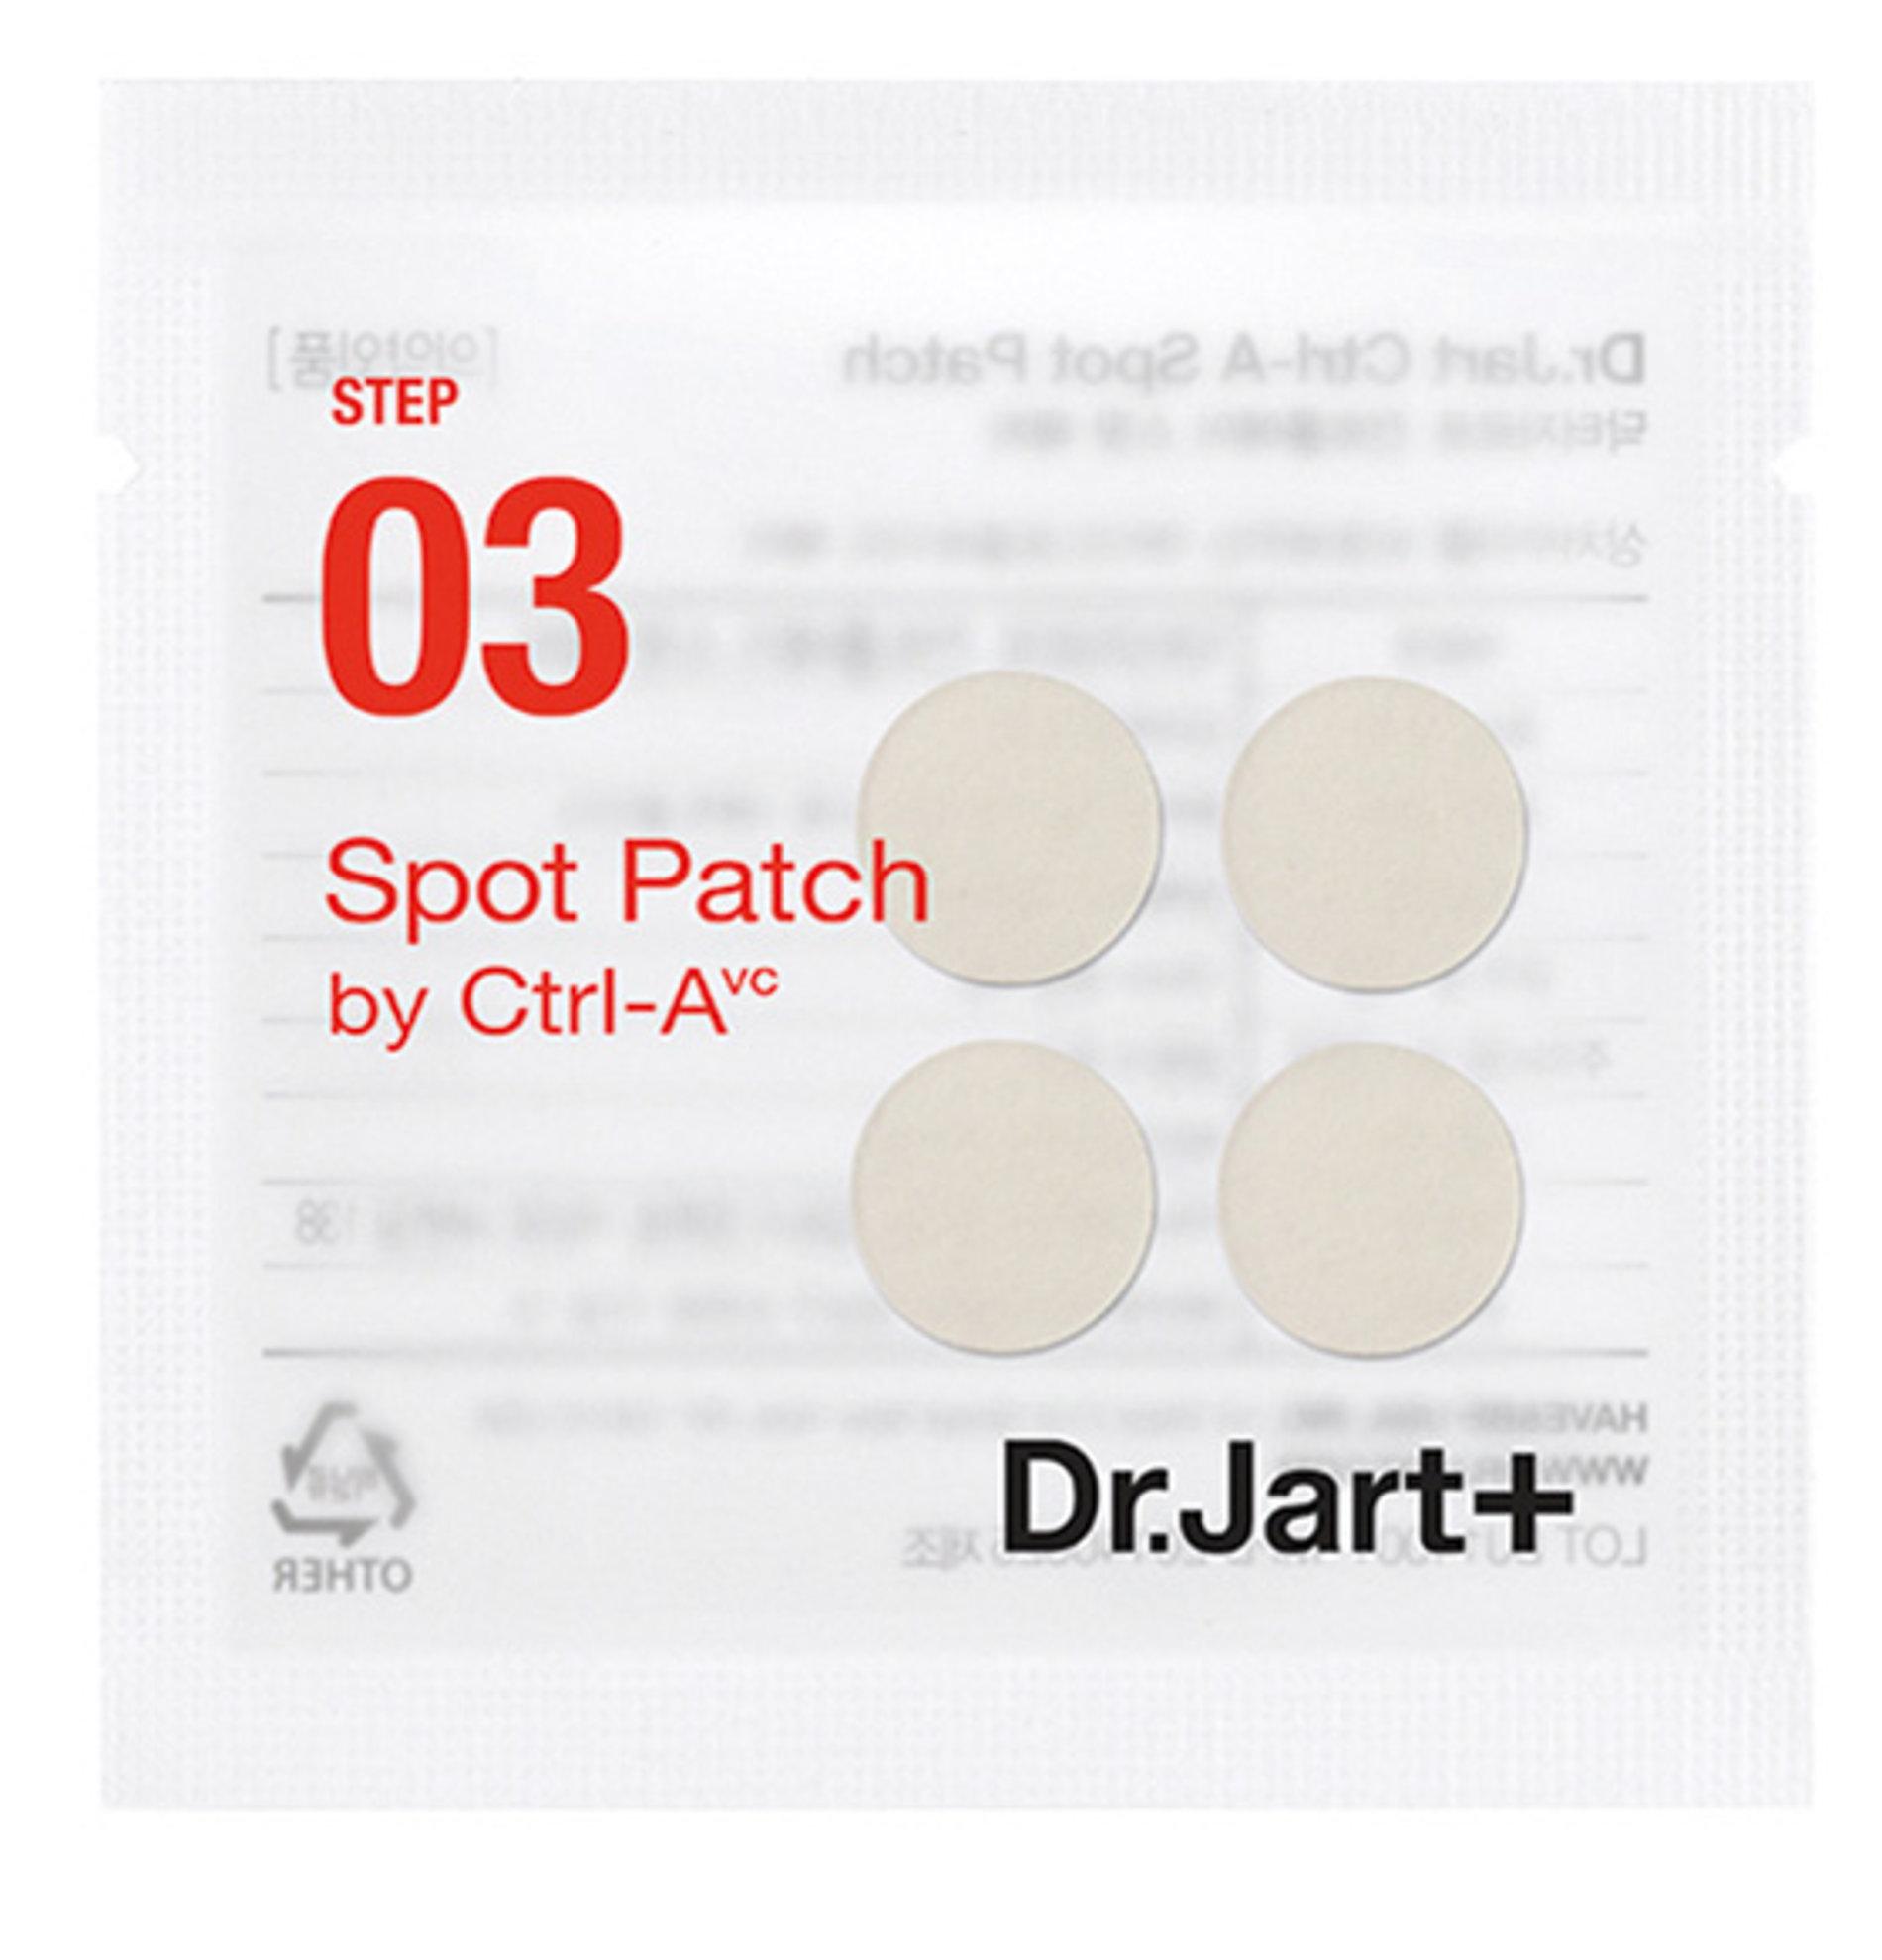 Dr.Jart Ctrl-A SOS Box | Red Dot Design Award